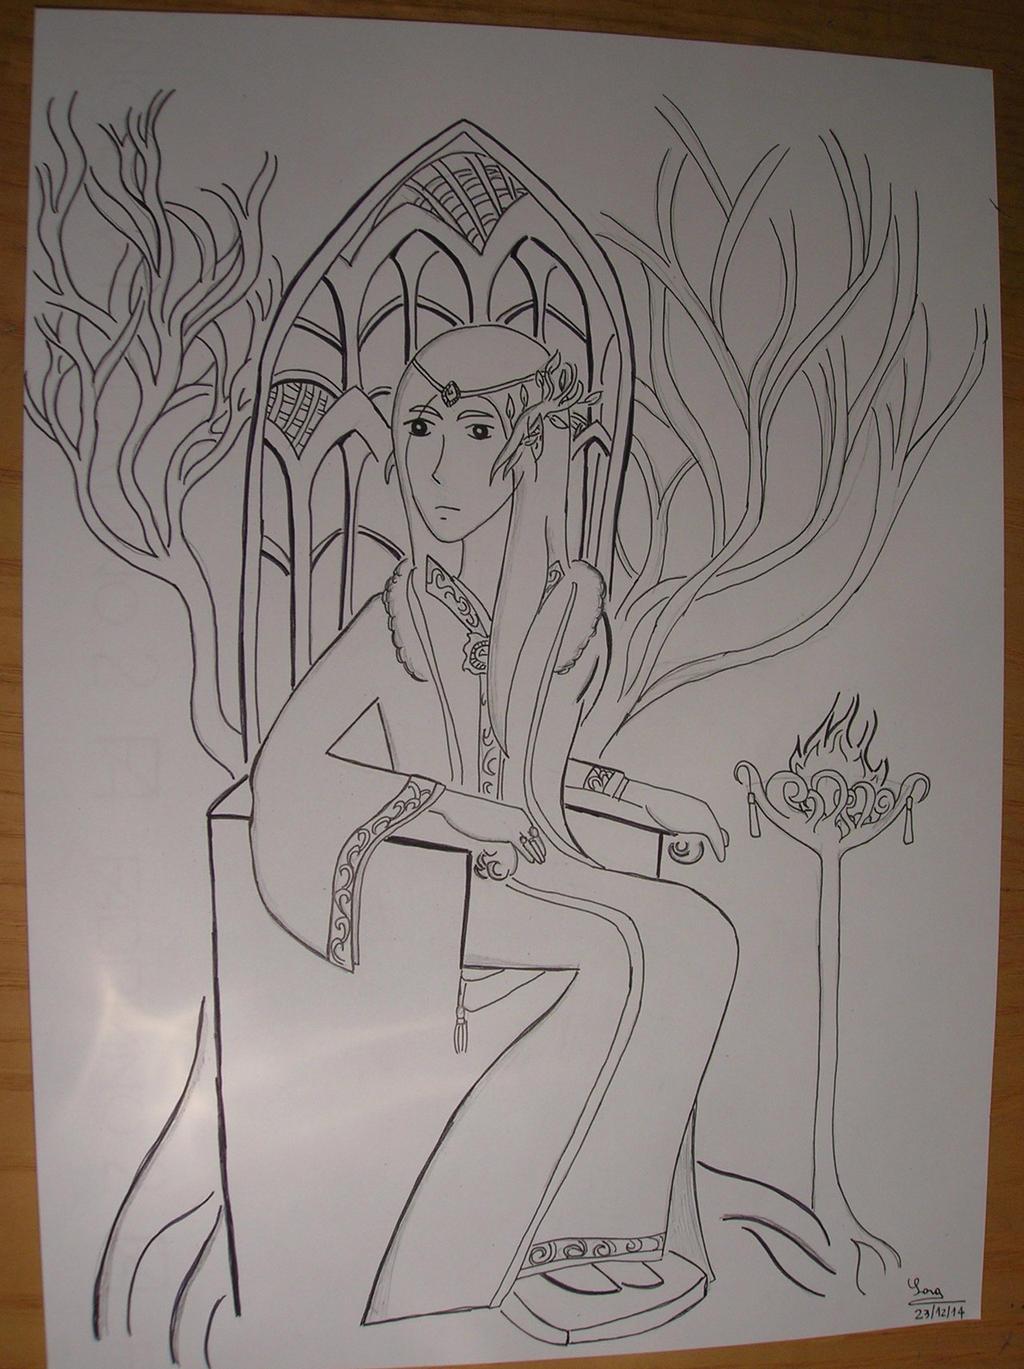 Thranduil, King of Mirkwood by saramarconato